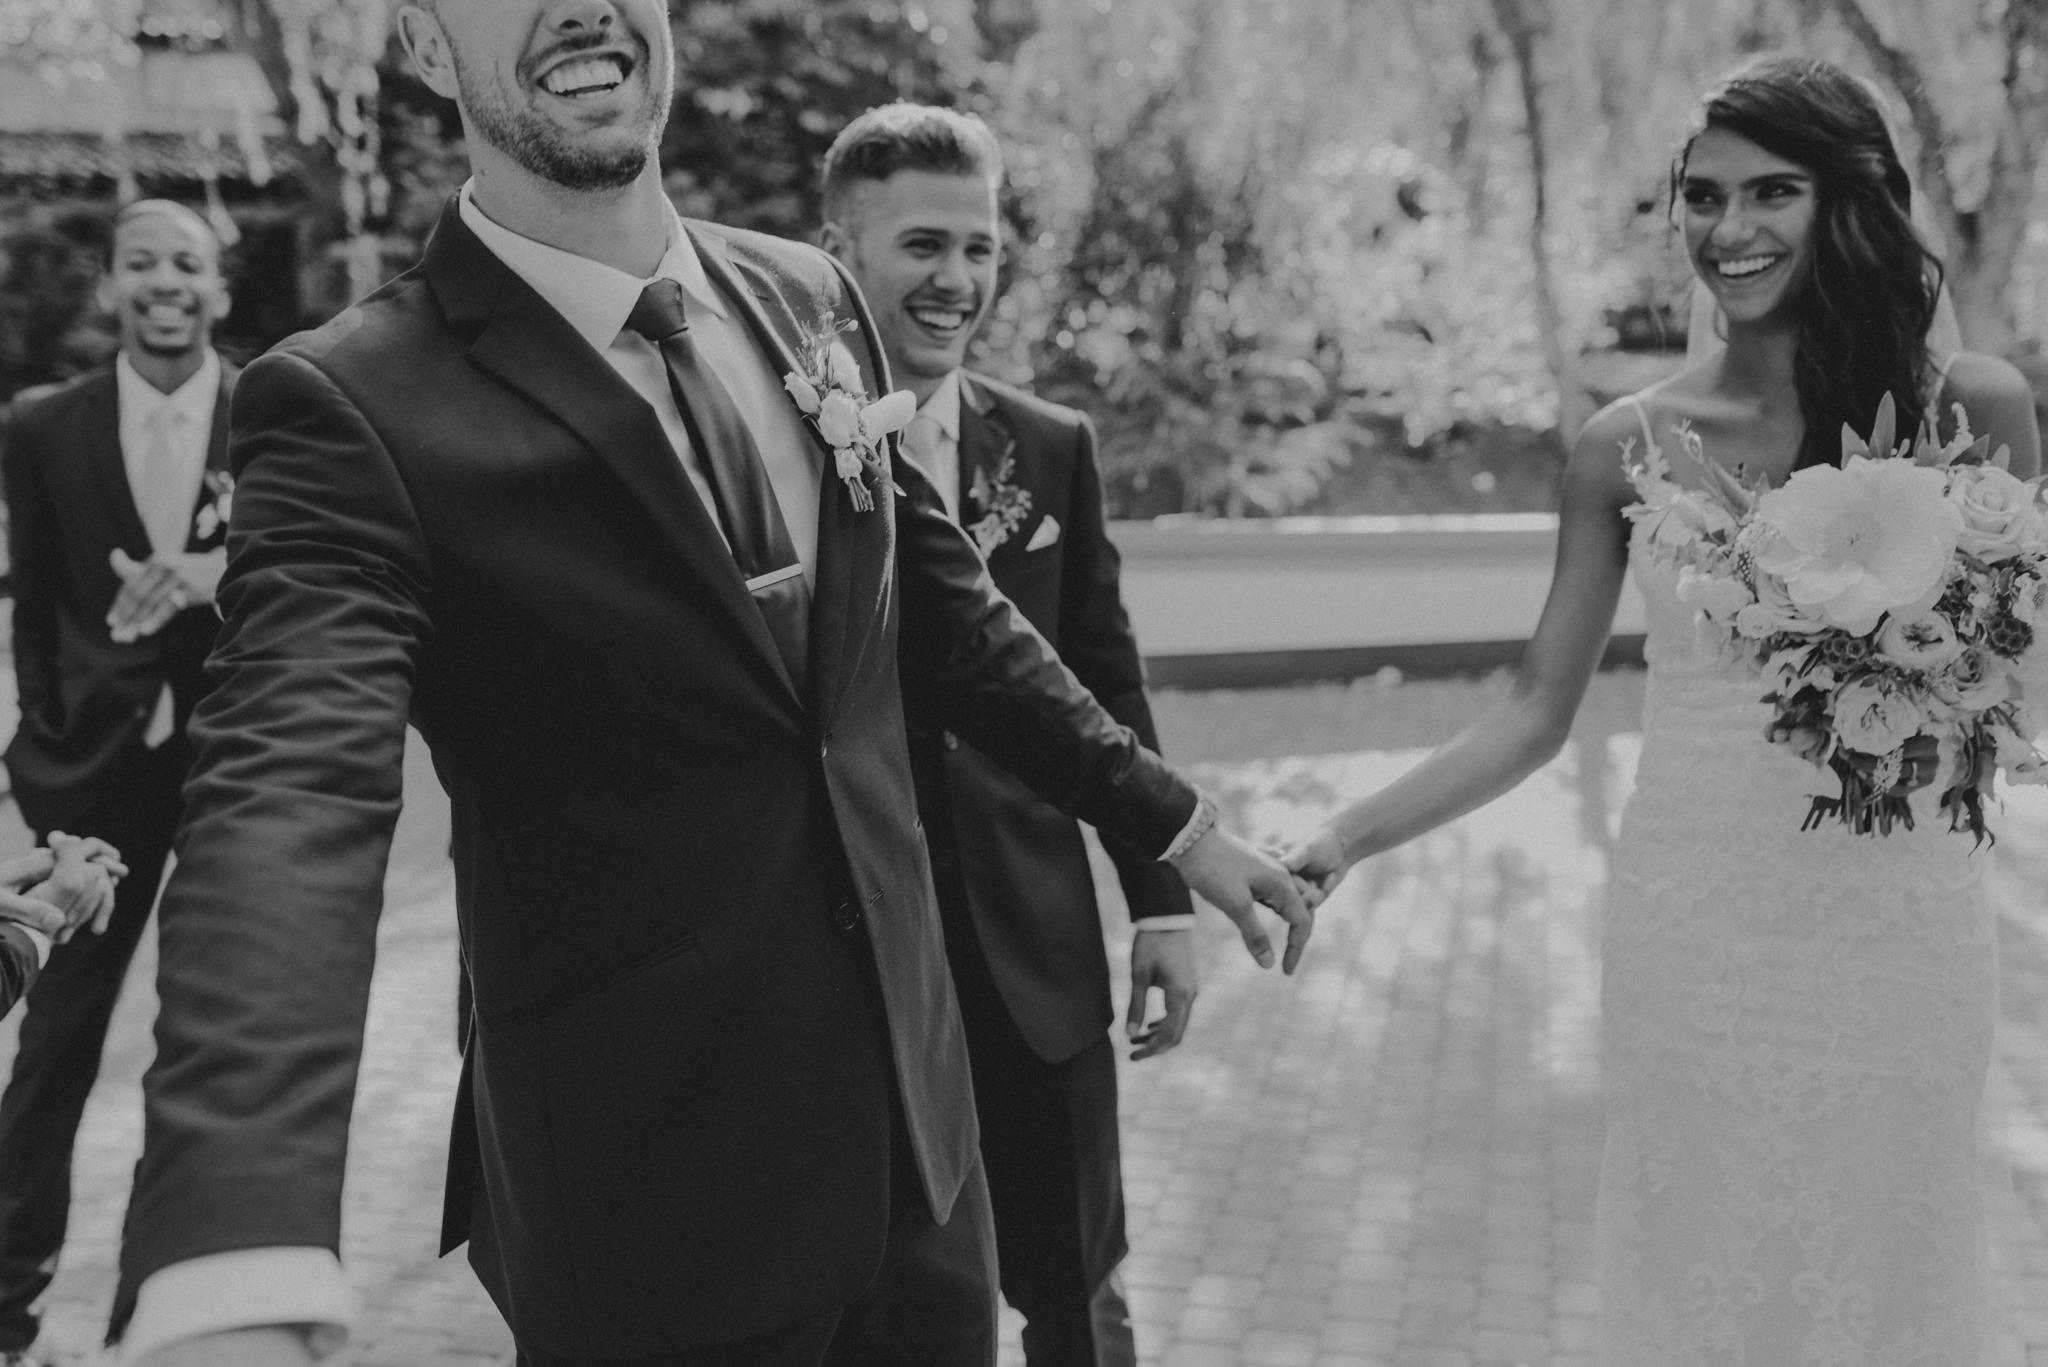 Isaiah + Taylor Photography - Rancho Las Lomas Wedding, Los Angeles Wedding Photographer-076.jpg